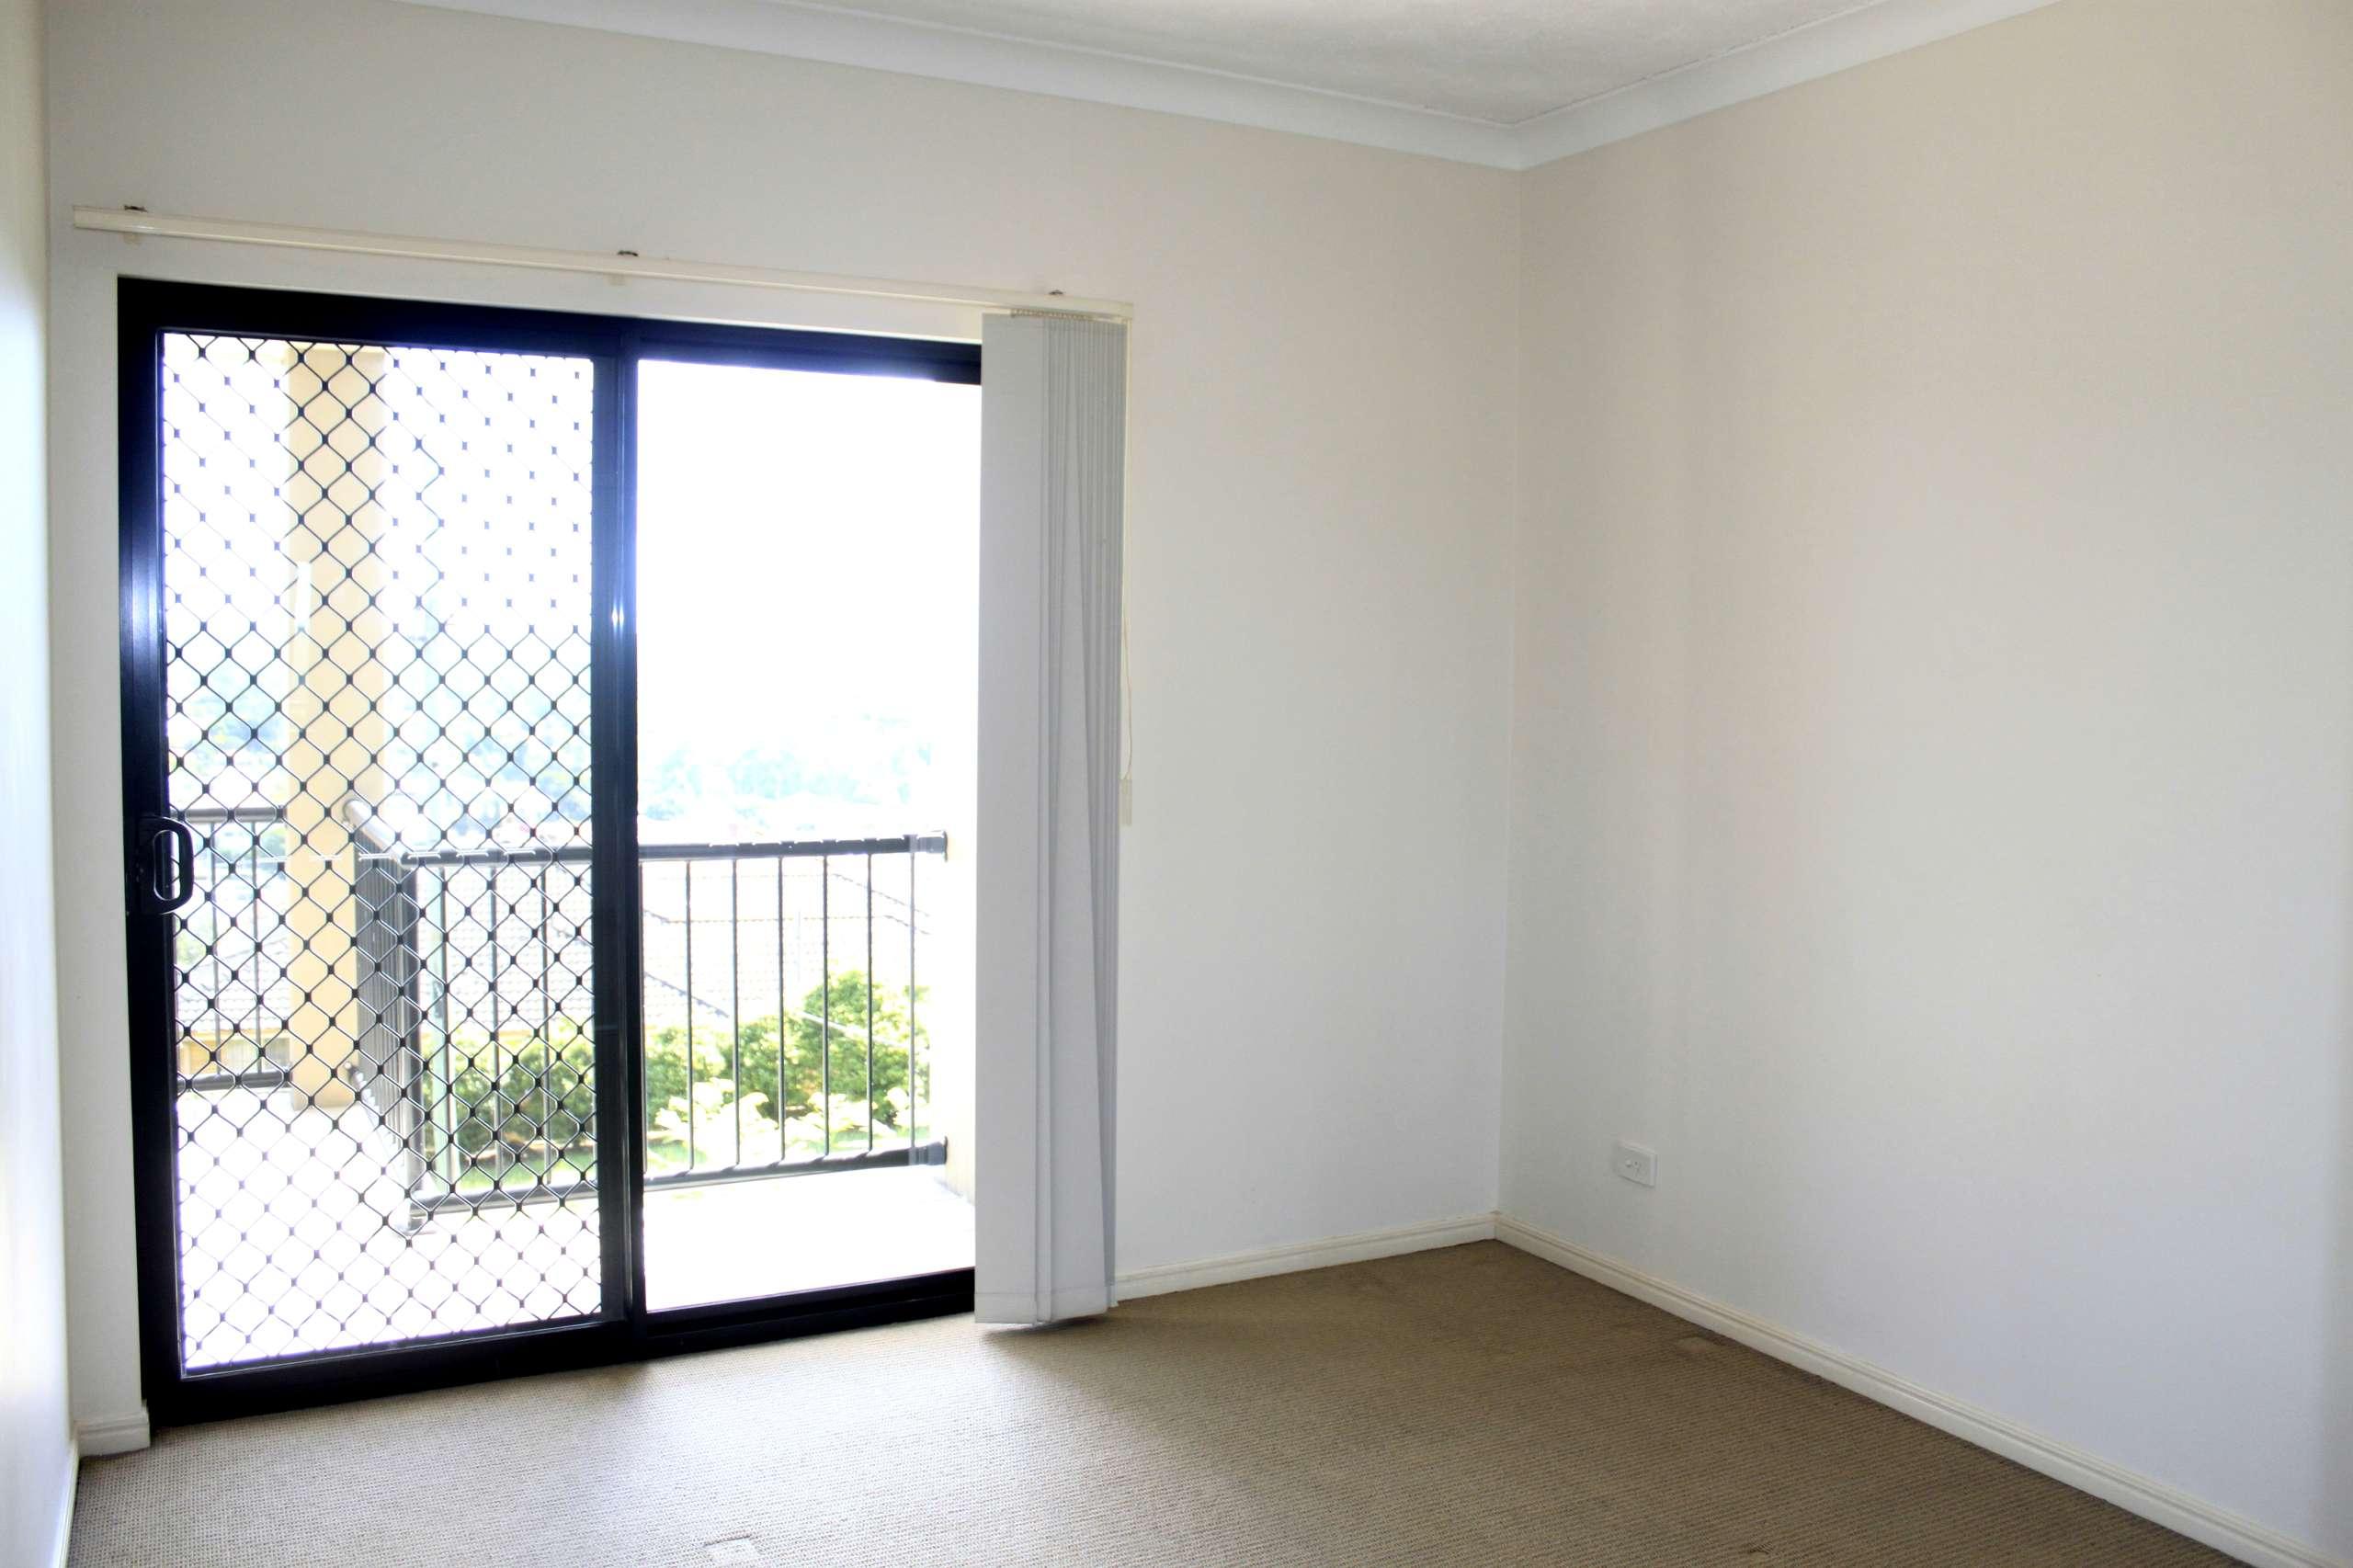 5/56 Crest Street, Mount Gravatt, QLD 4122